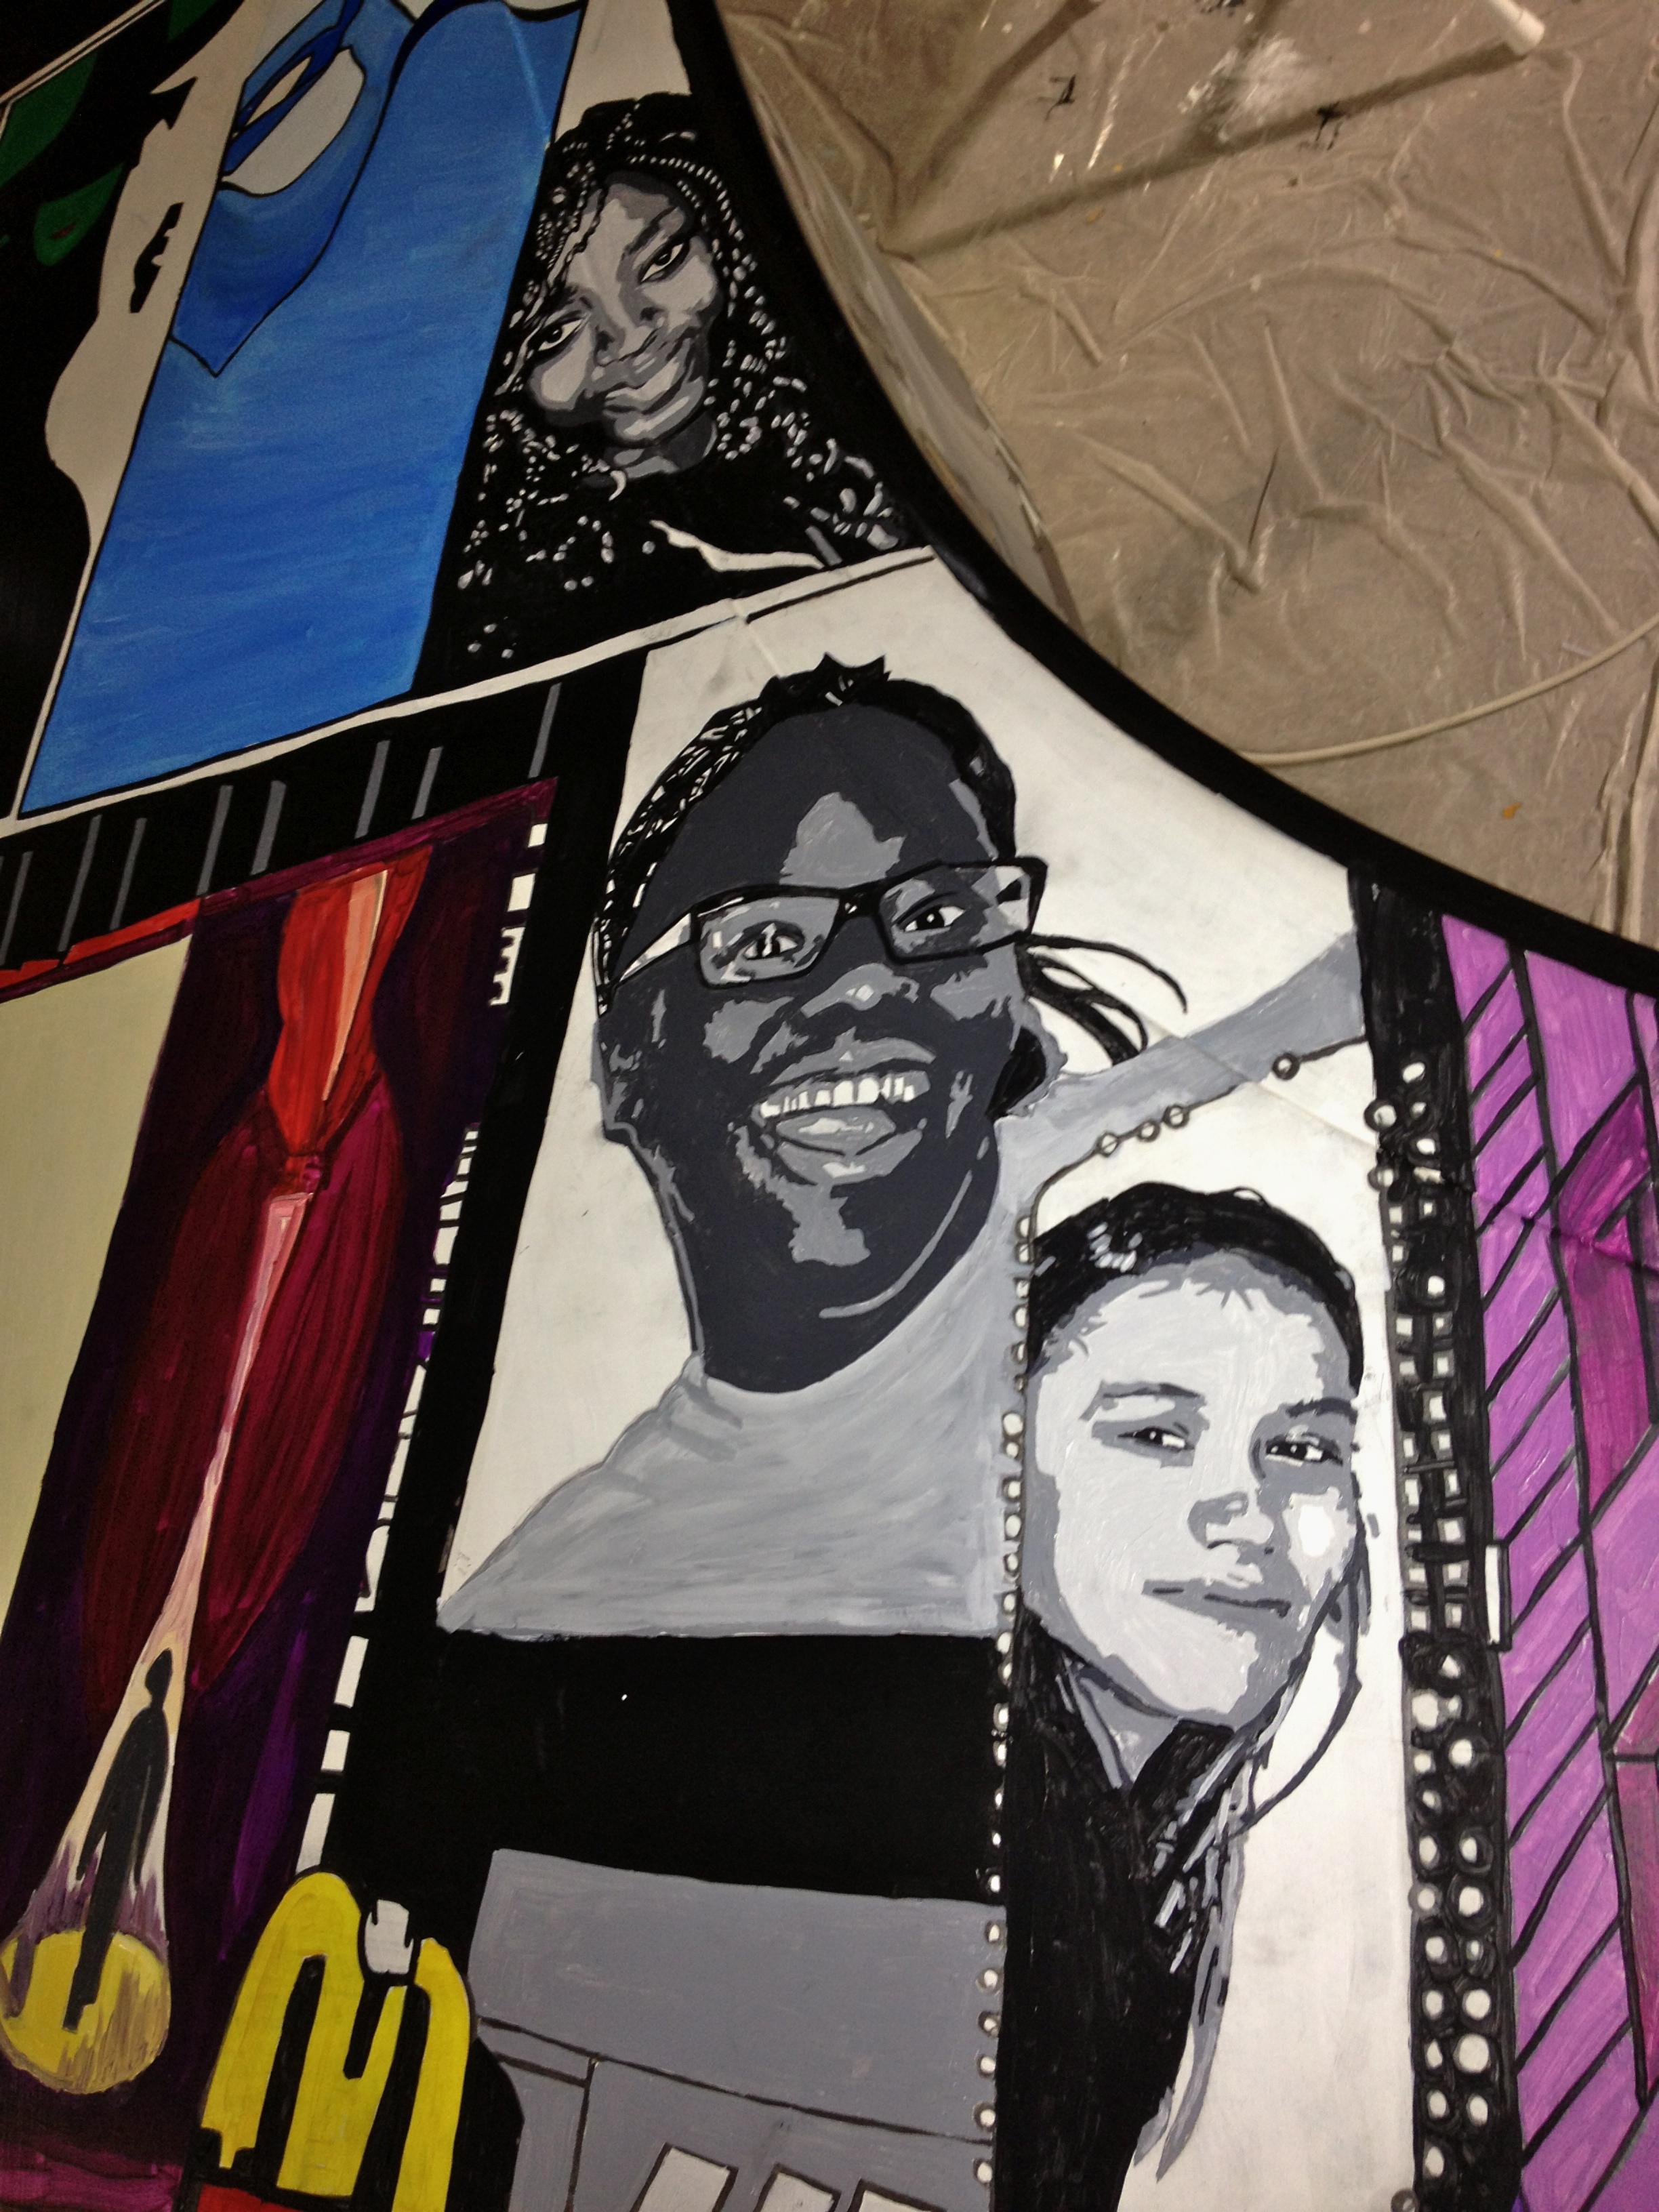 Piano top - Portraits in progress